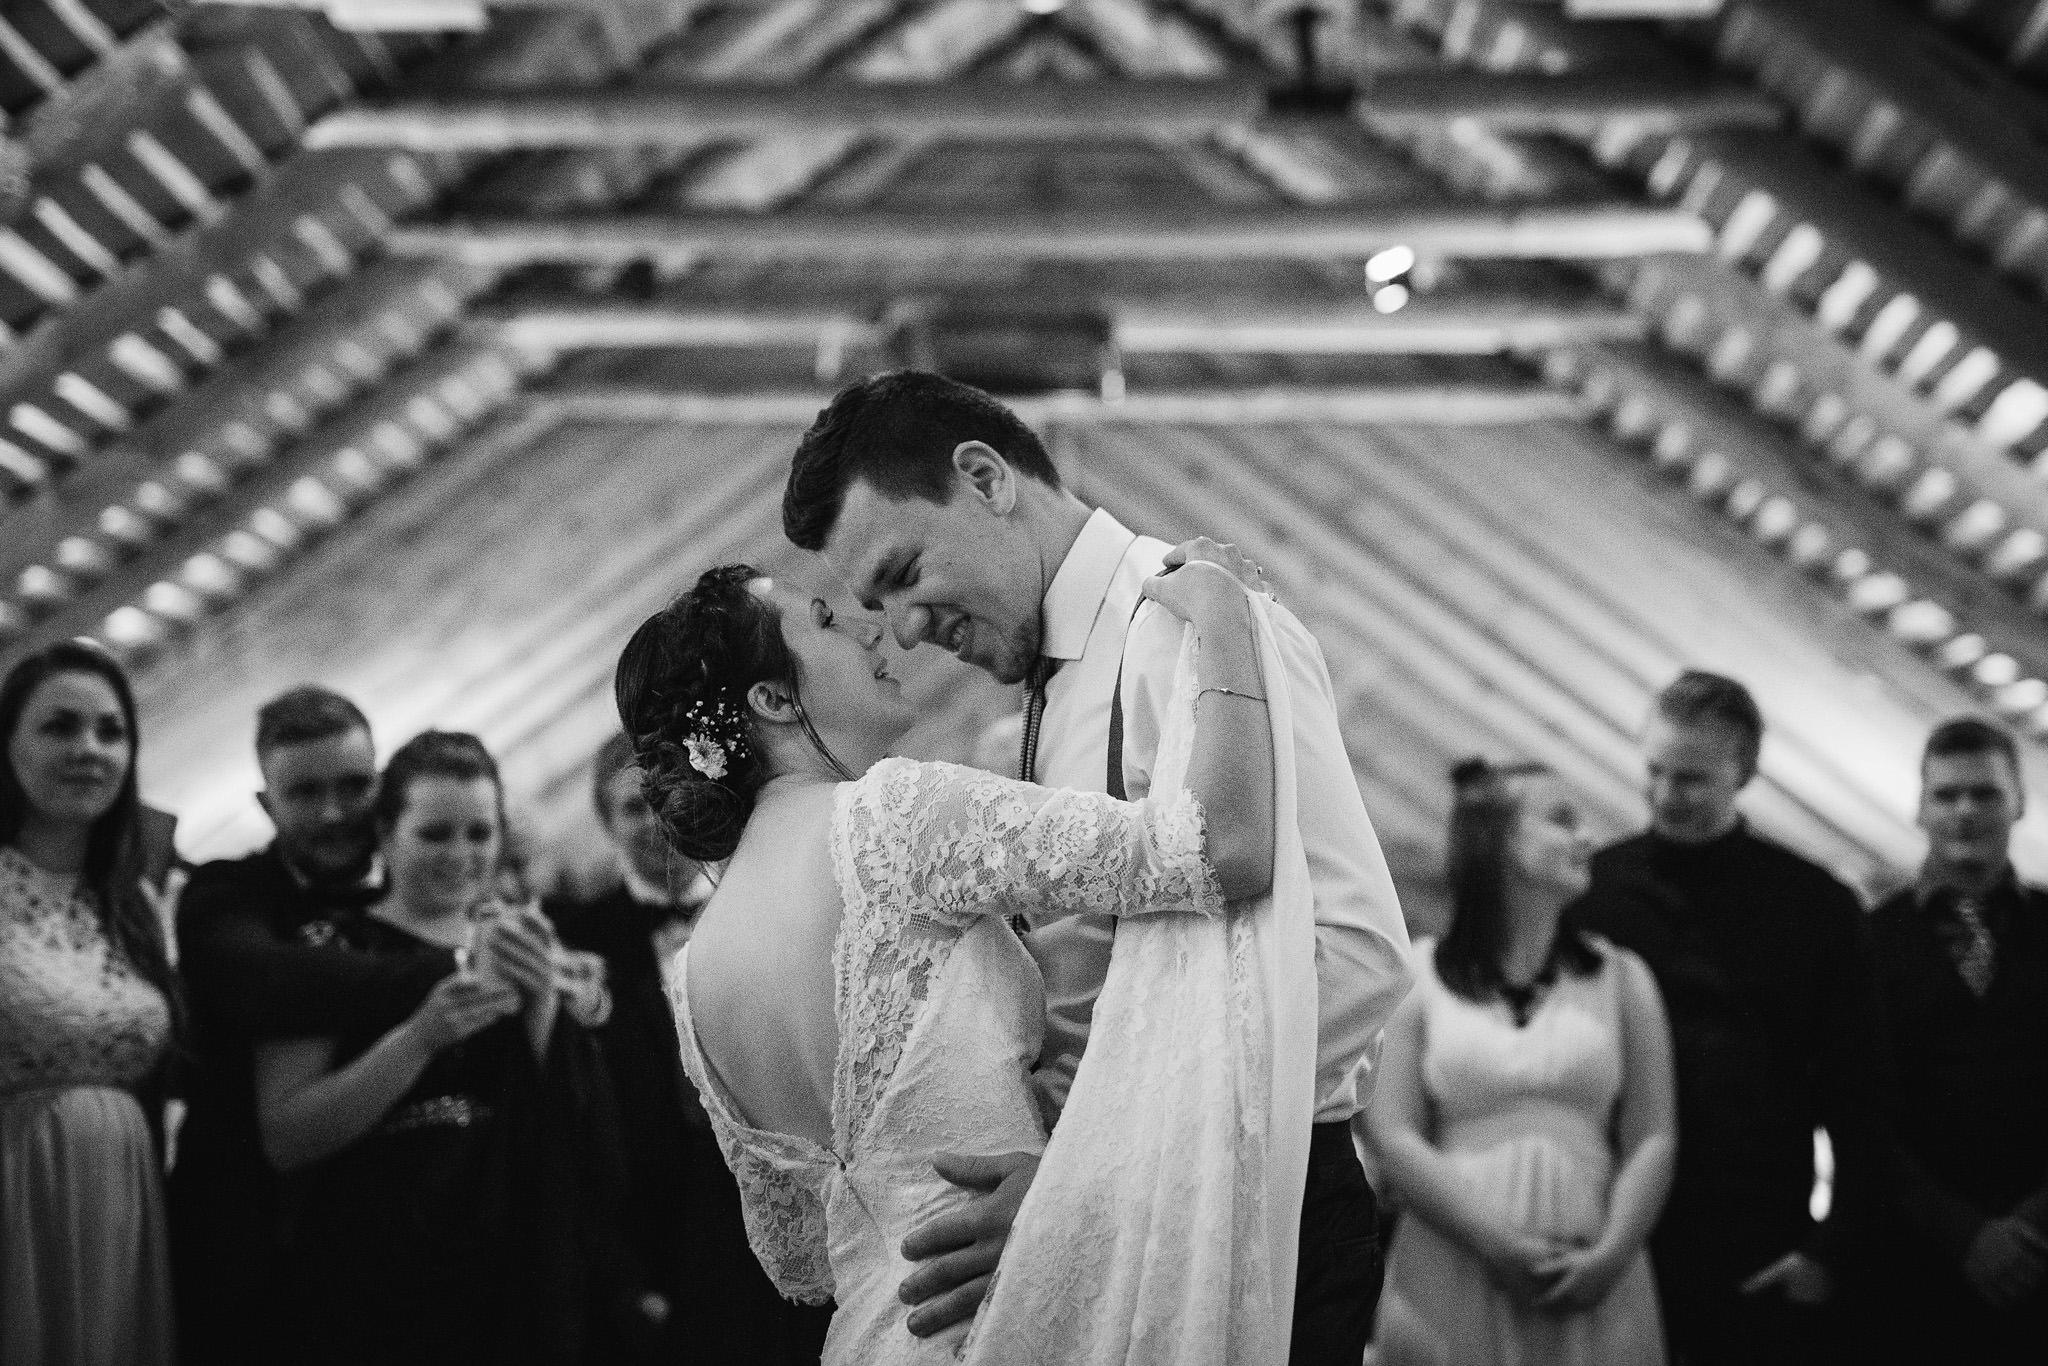 Norway+wedding+photographer+elopement+pre+wedding+Casey+Arneson-128.jpg